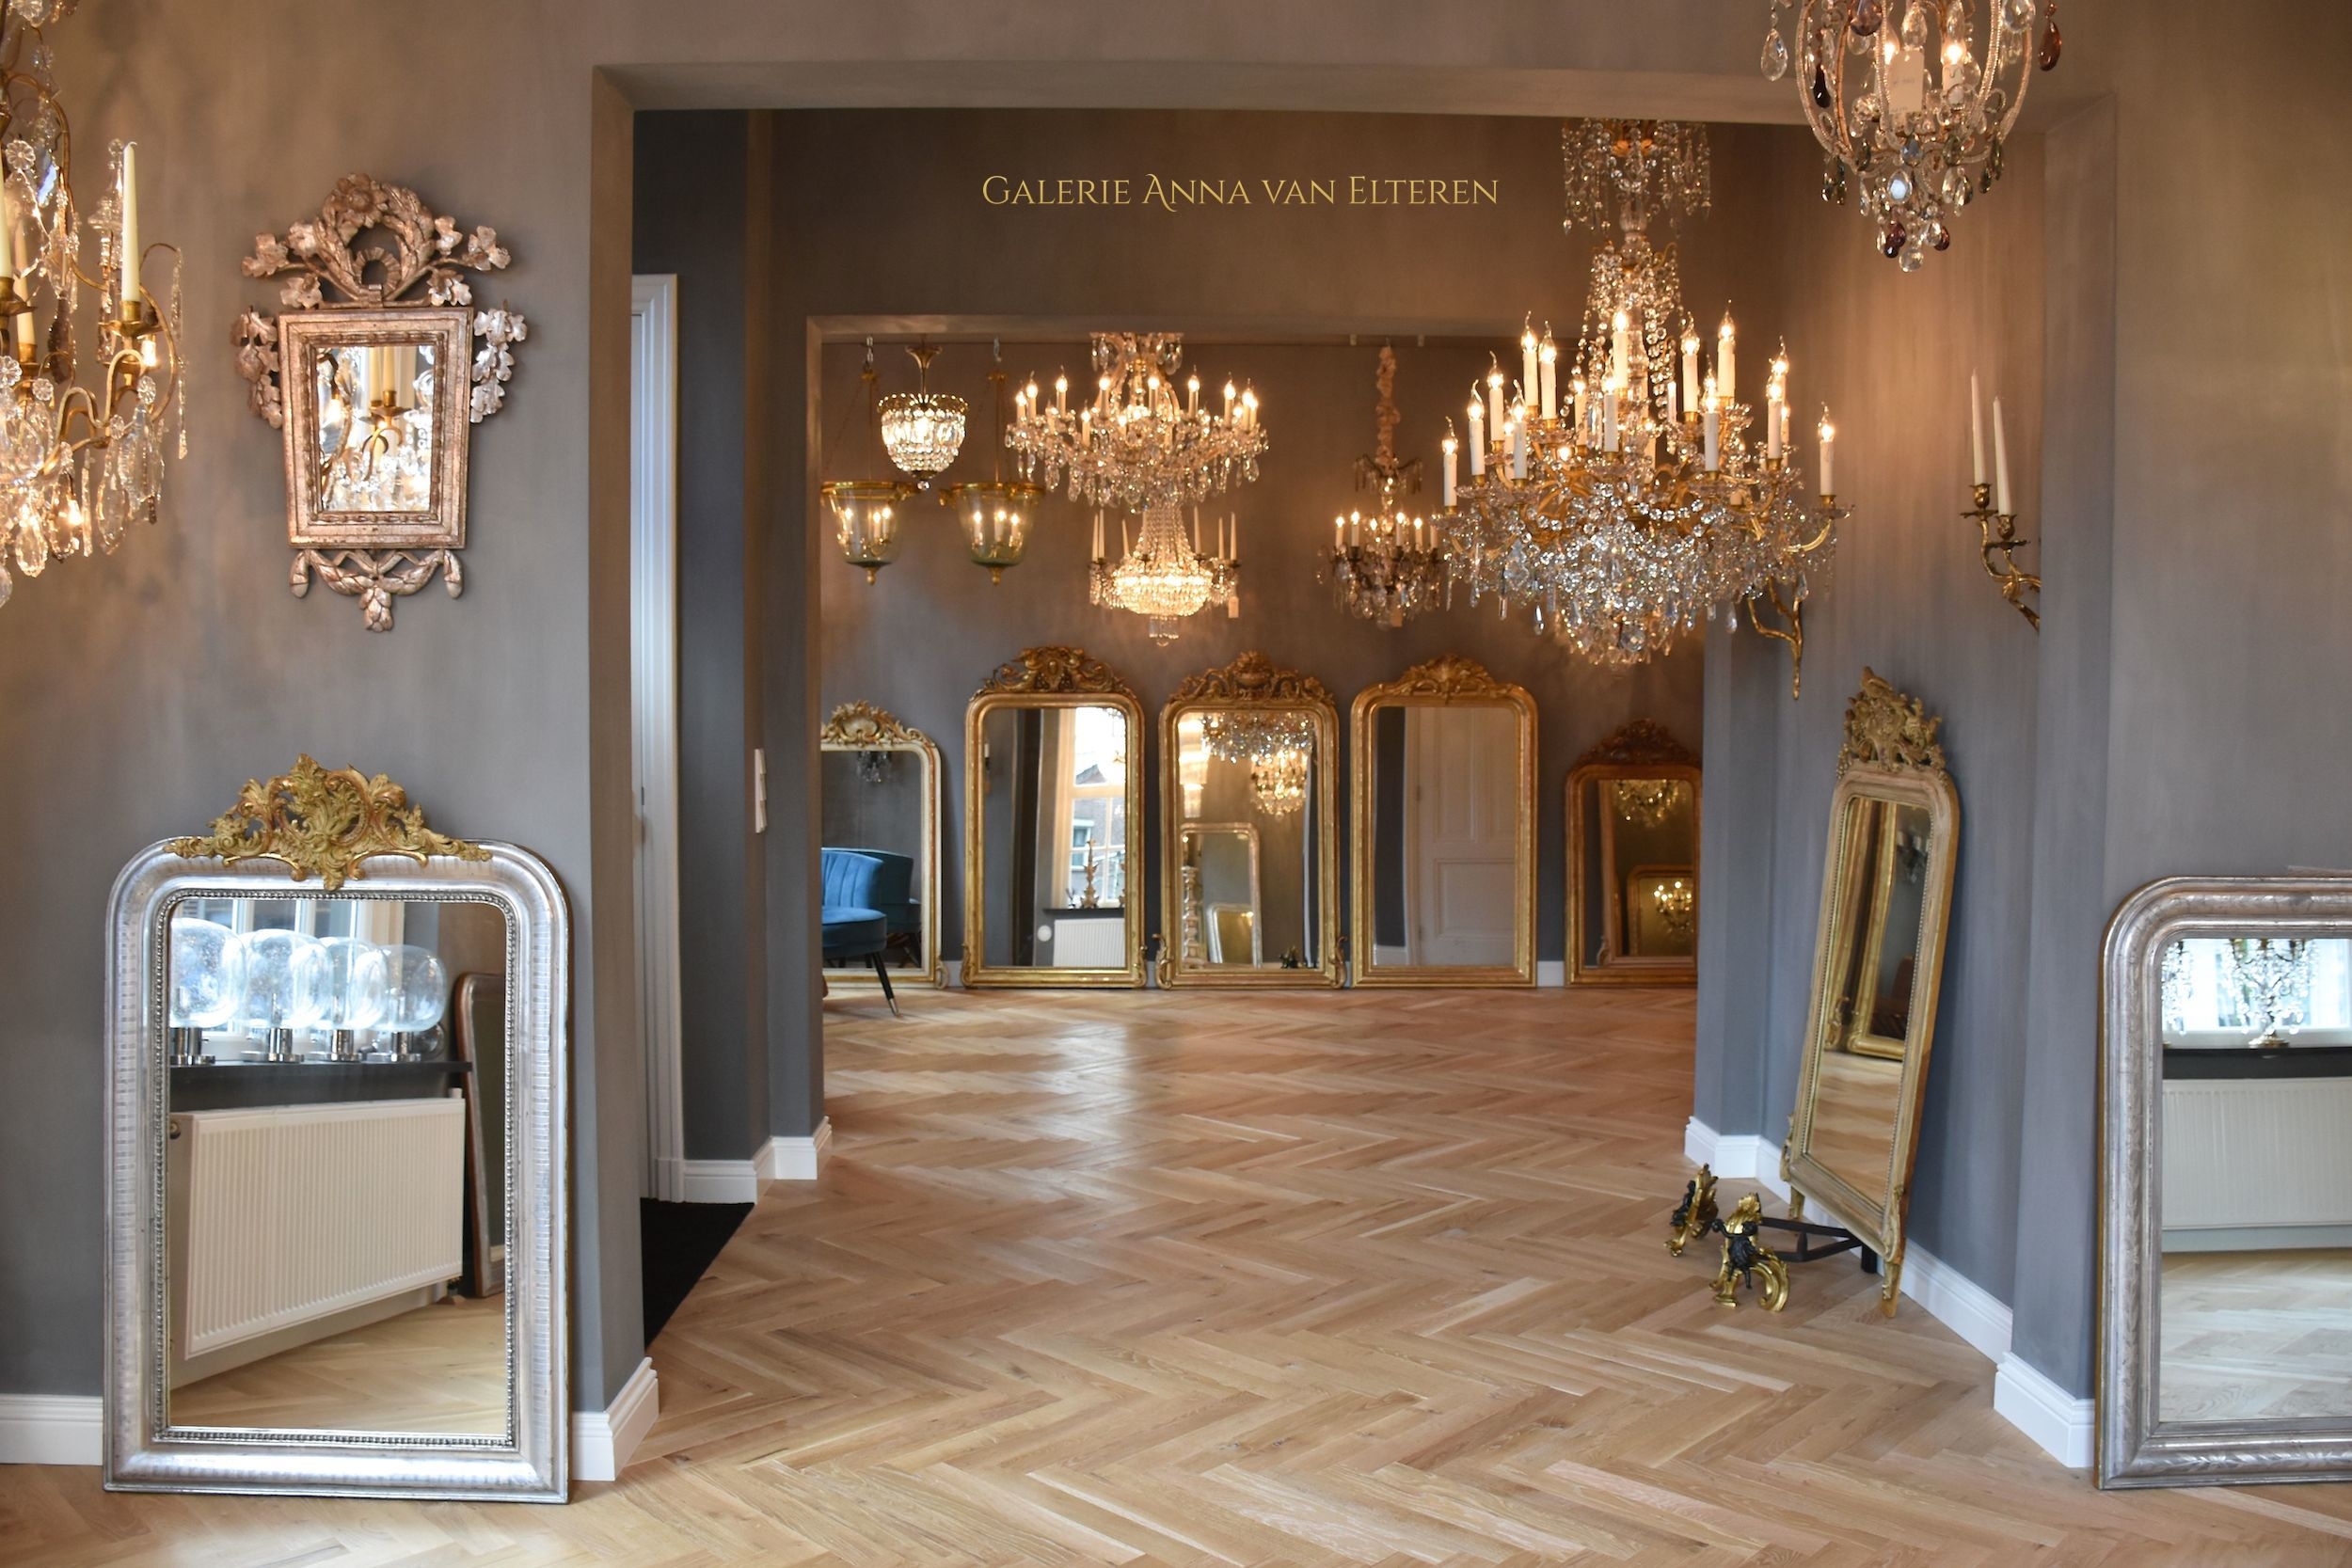 Galerie Anna van Elteren